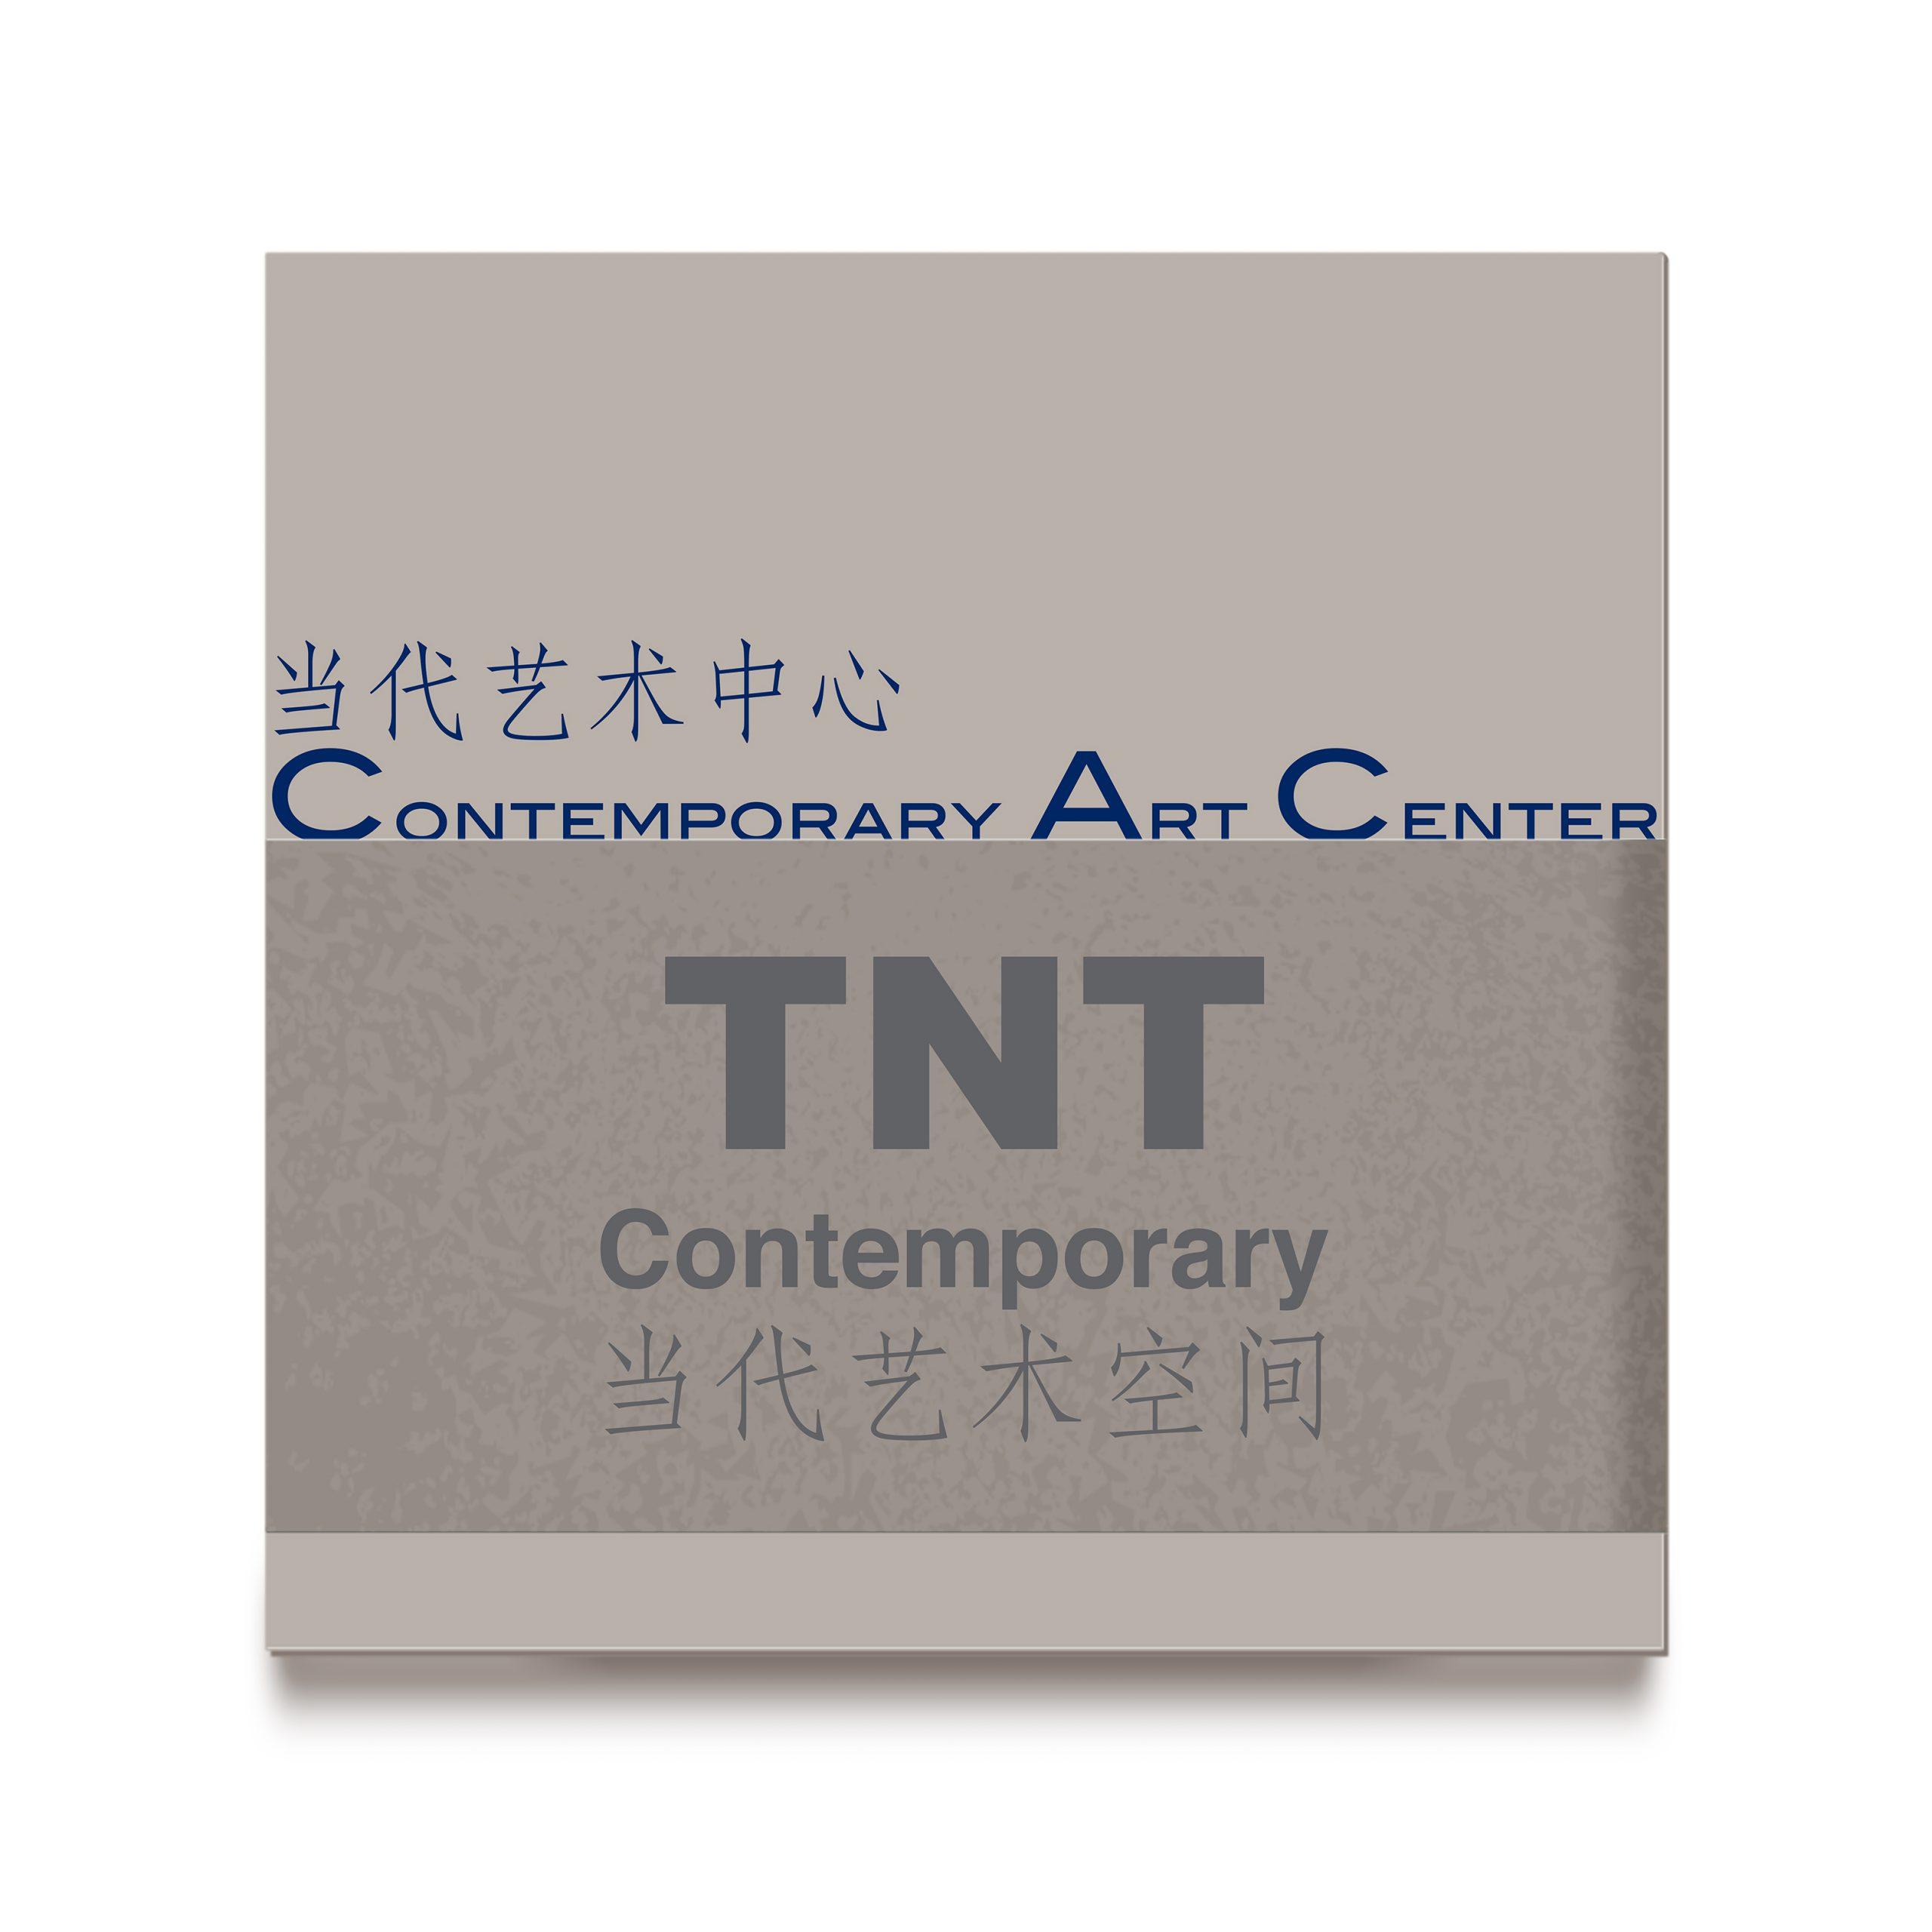 TNT Contemporary Art Center